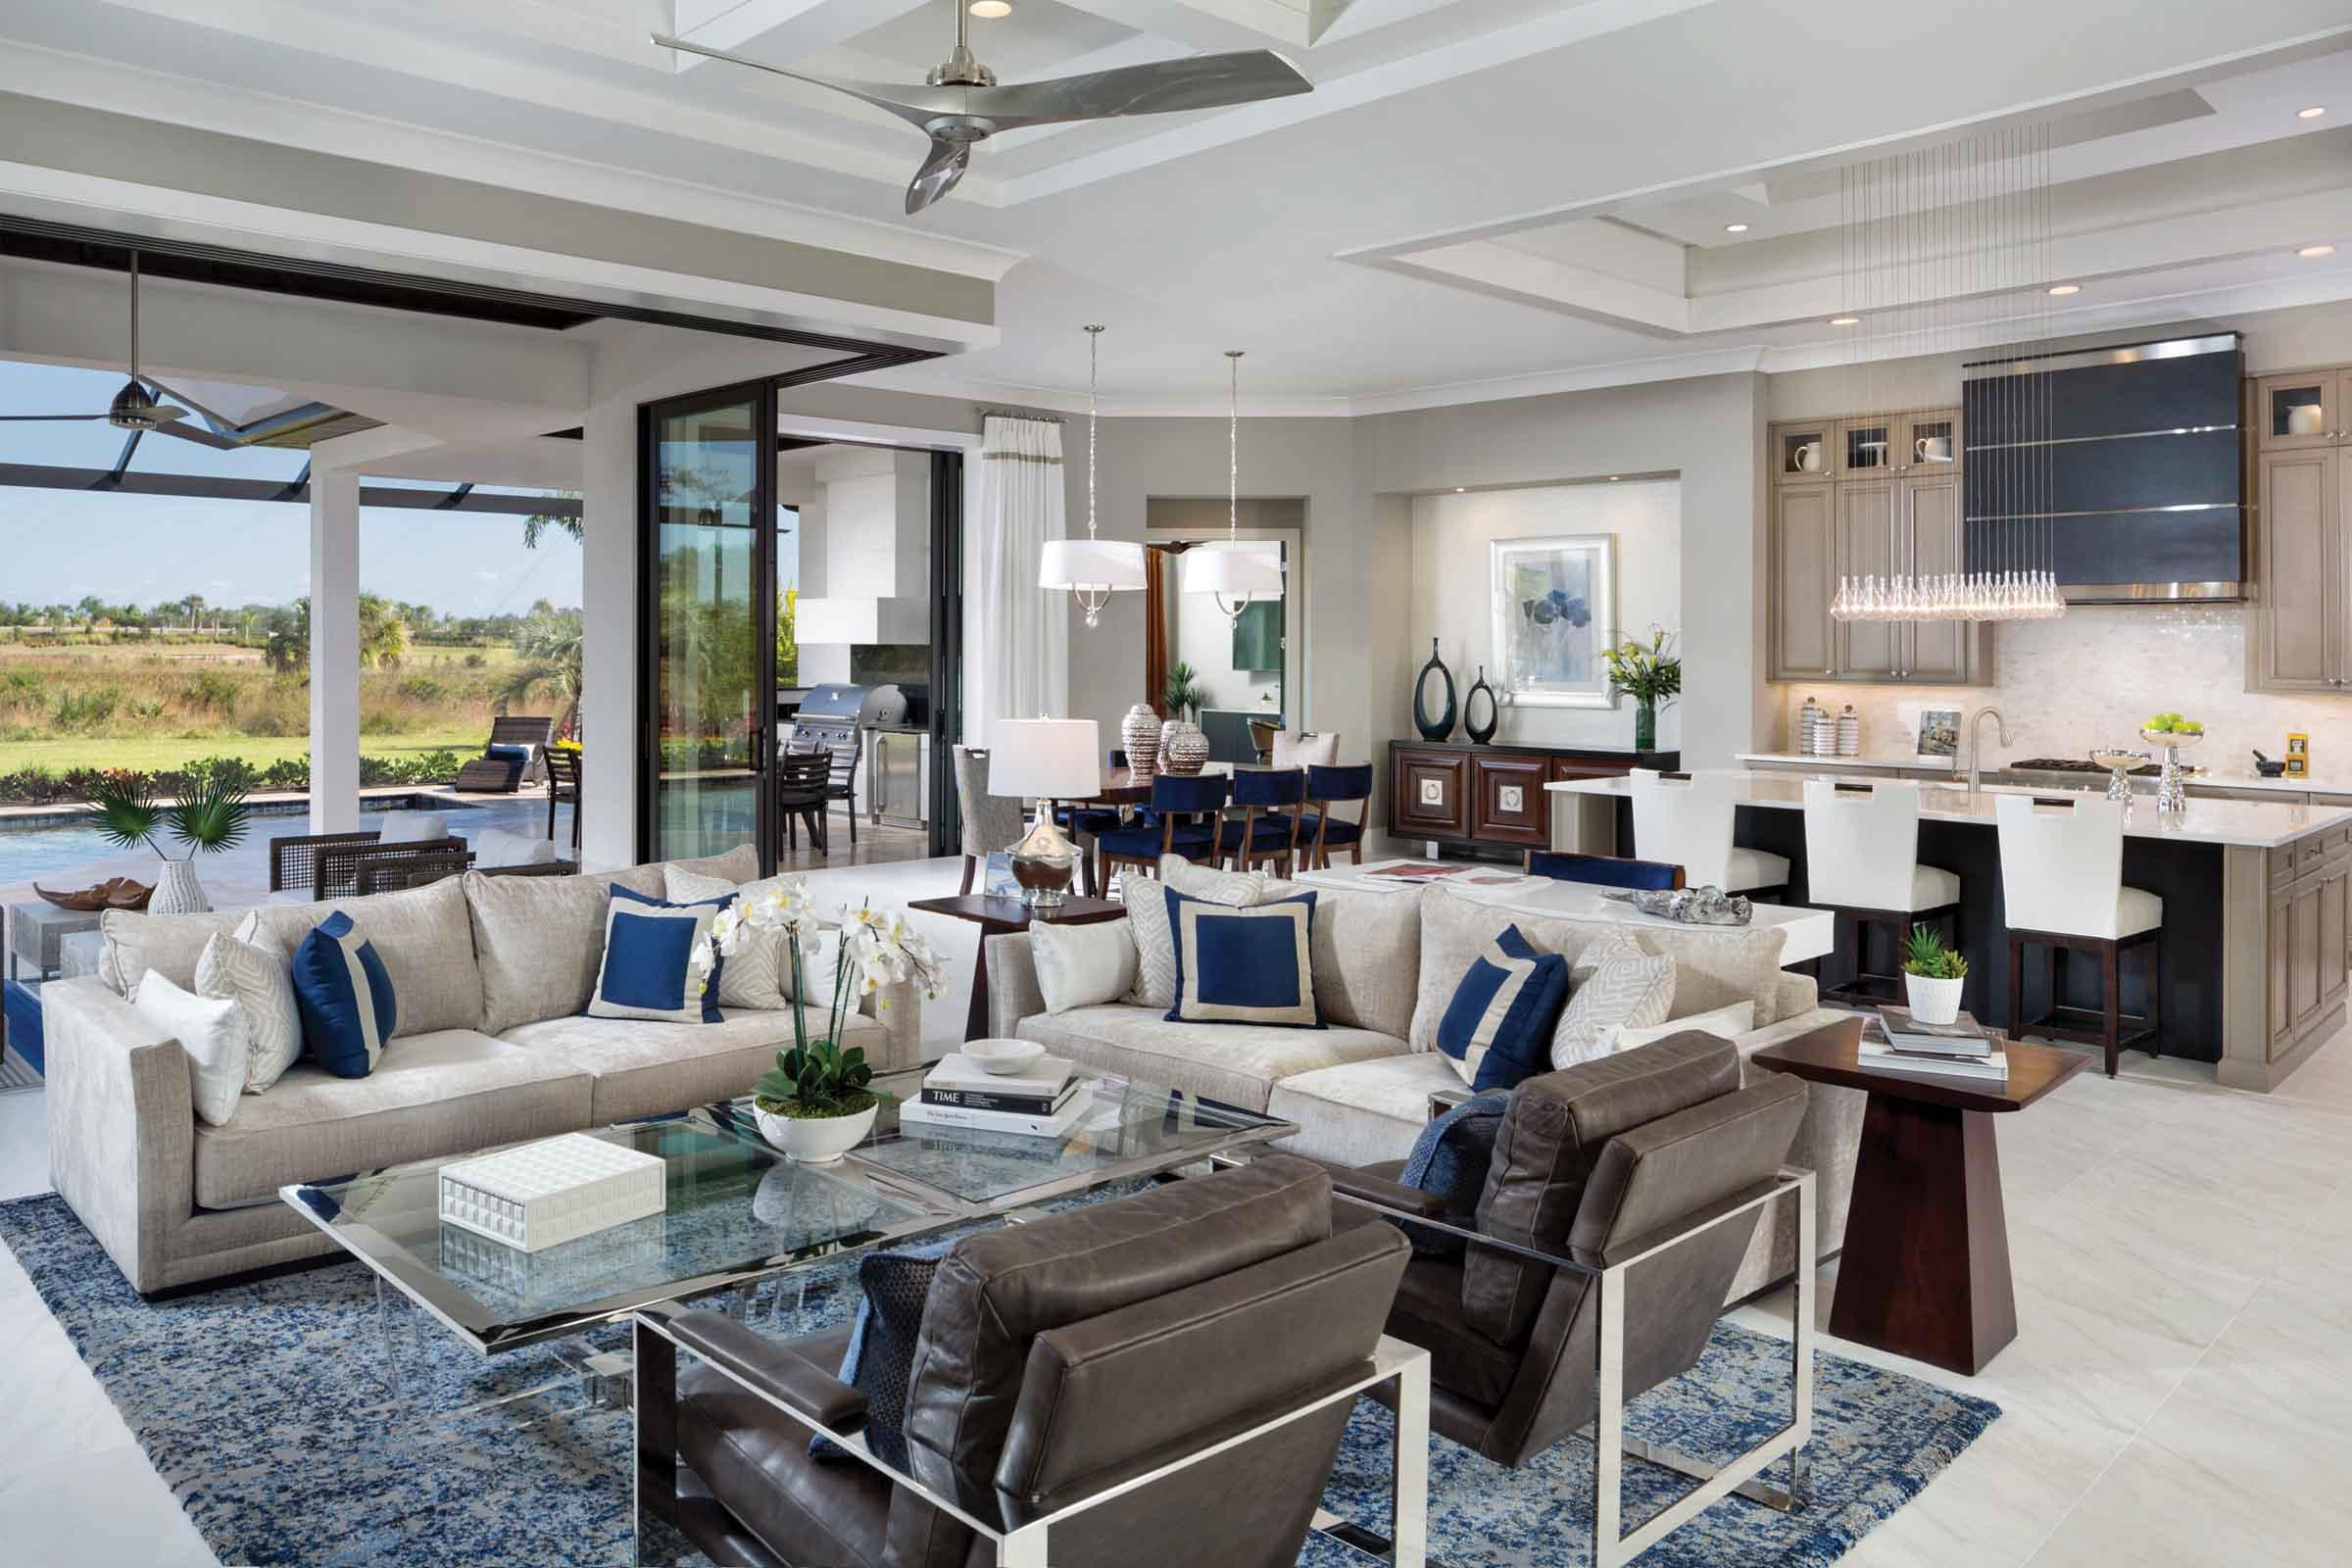 10157 Sandpine Lane, Hobe Sound, Florida 33455, 4 Bedrooms Bedrooms, ,4 BathroomsBathrooms,A,Single family,Sandpine,RX-10474993